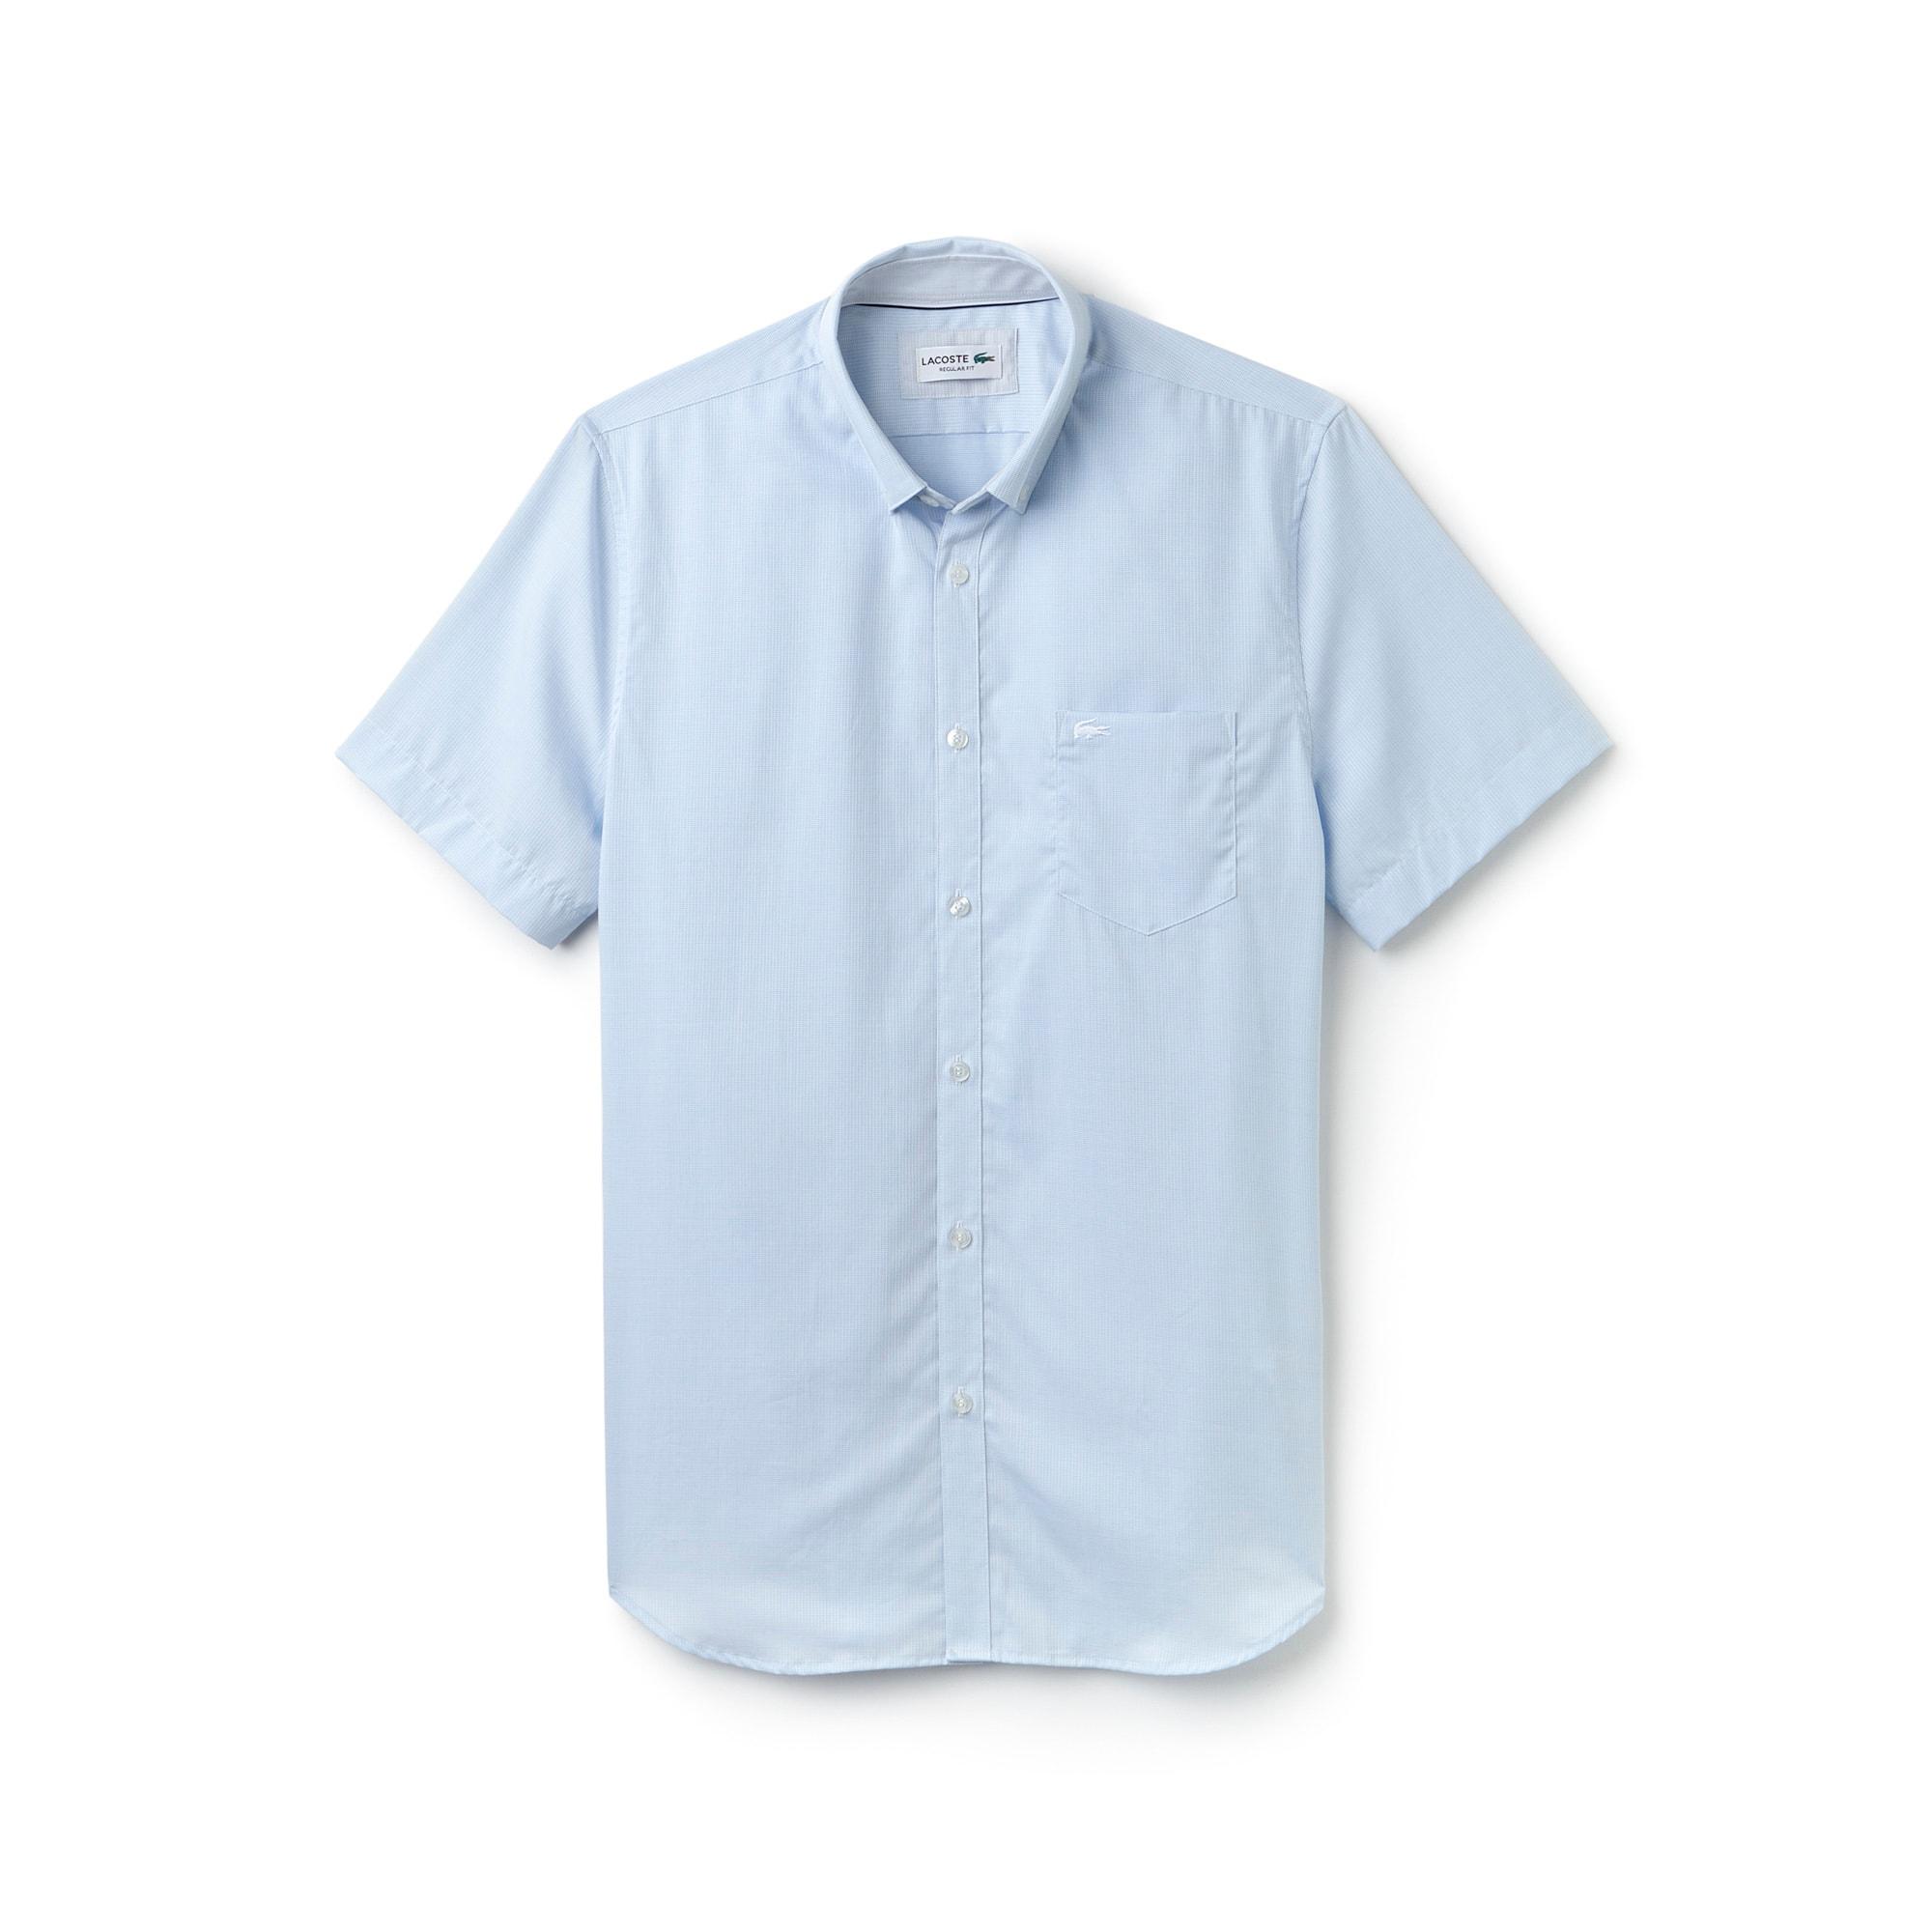 Camisa Regular Fit de manga curta em popelina texturada